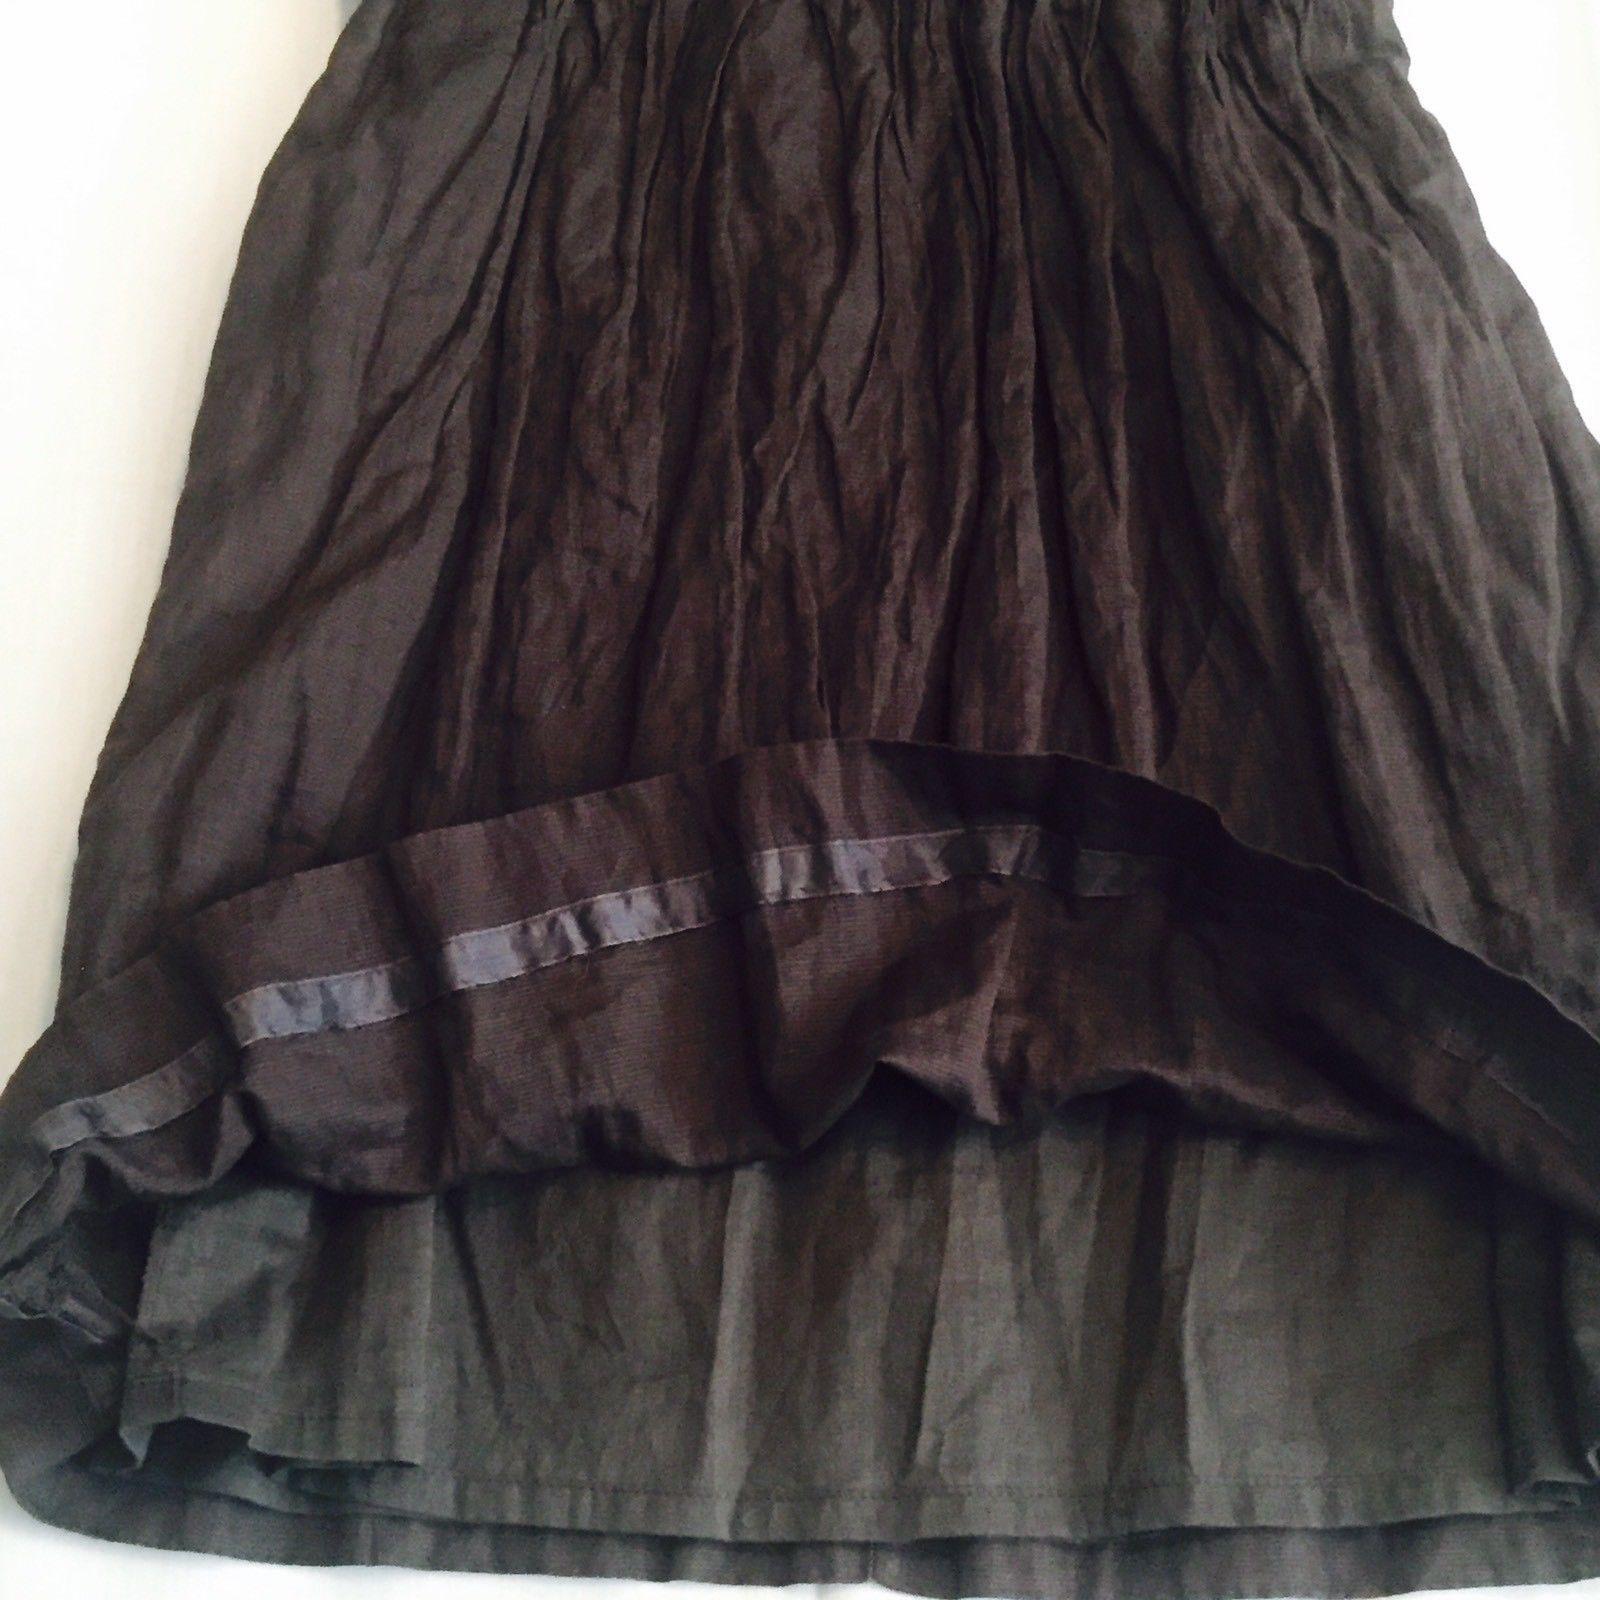 J. Crew Taryan Dress Brown Size 2 Strapless Empire Waist